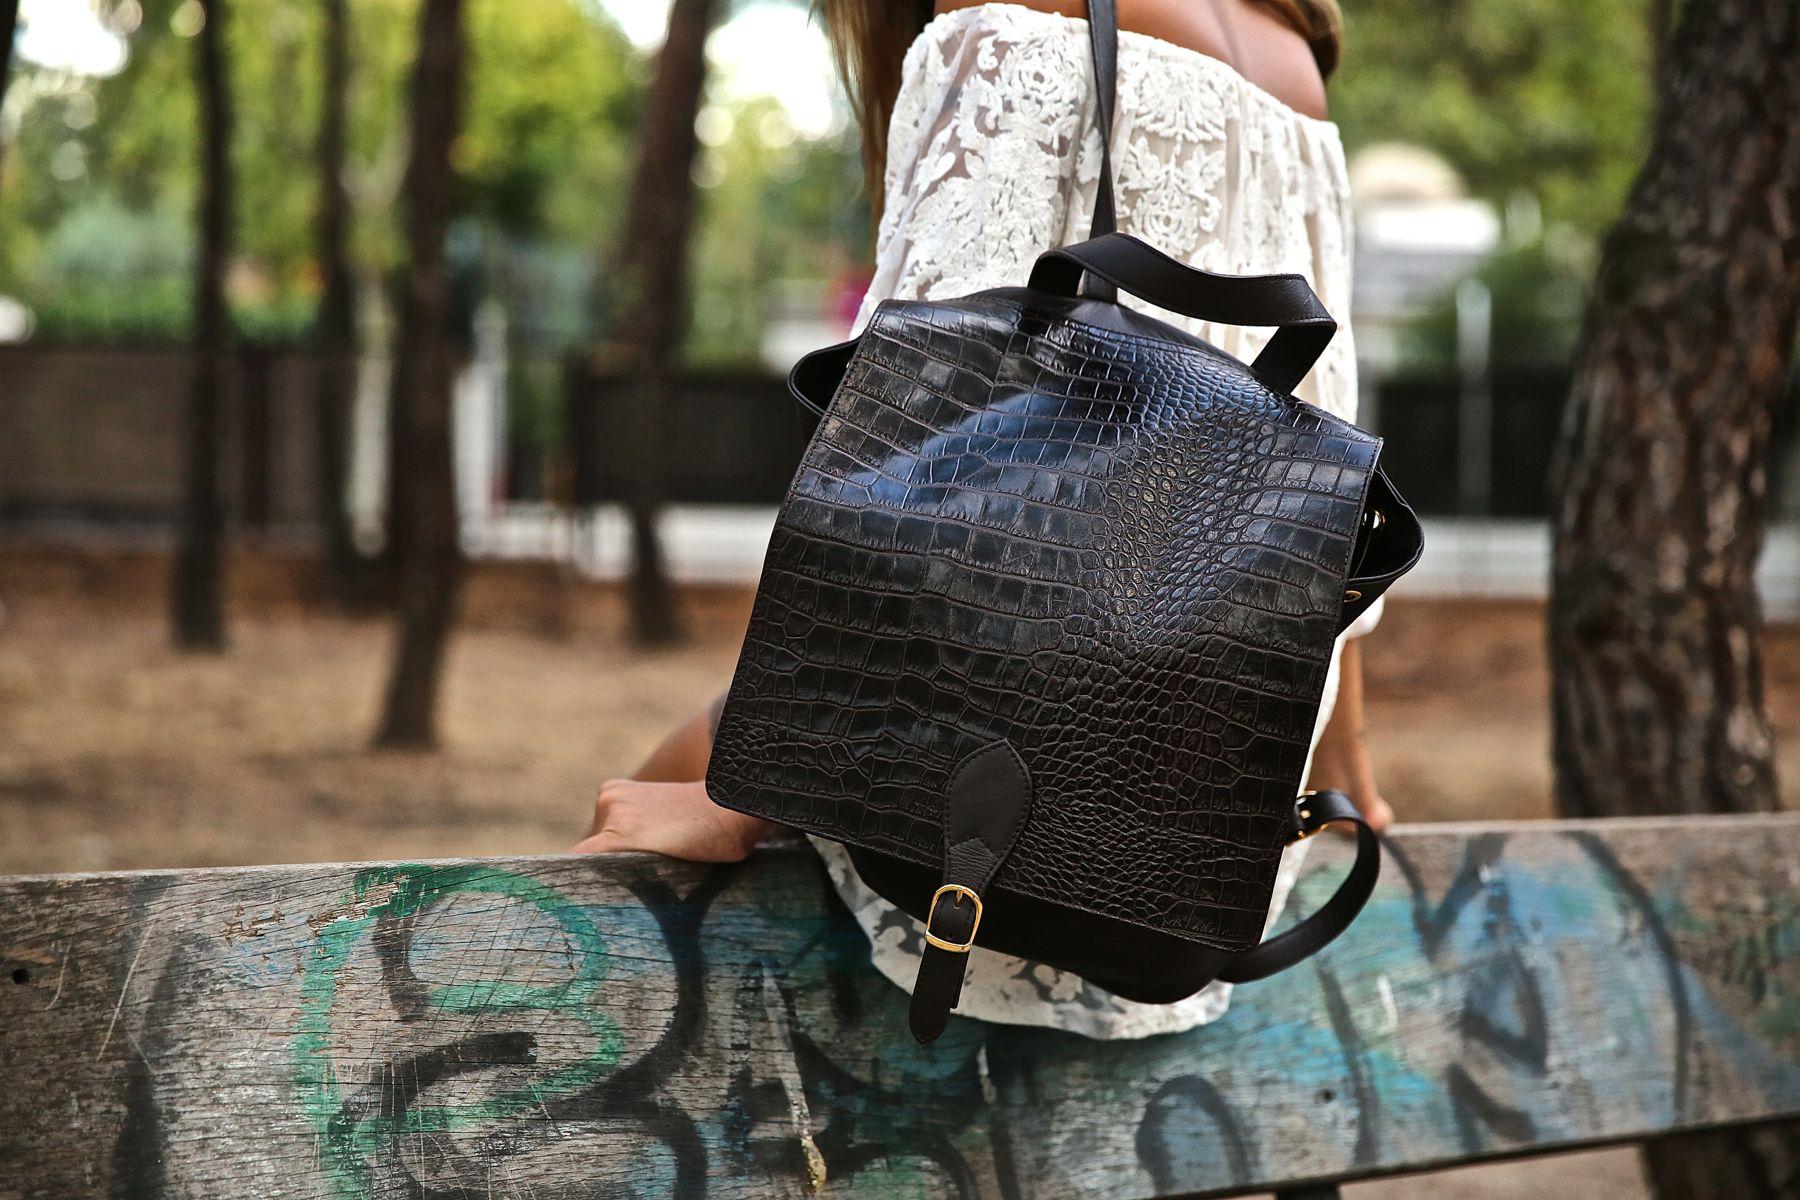 trendy_taste-look-outfit-street_style-ootd-blog-blogger-fashion_spain-moda_españa-primavera/verano-boho-trendy-planes_de_día-lentejuelas-falda-botines-étnico-mochila-crochet-encaje-7